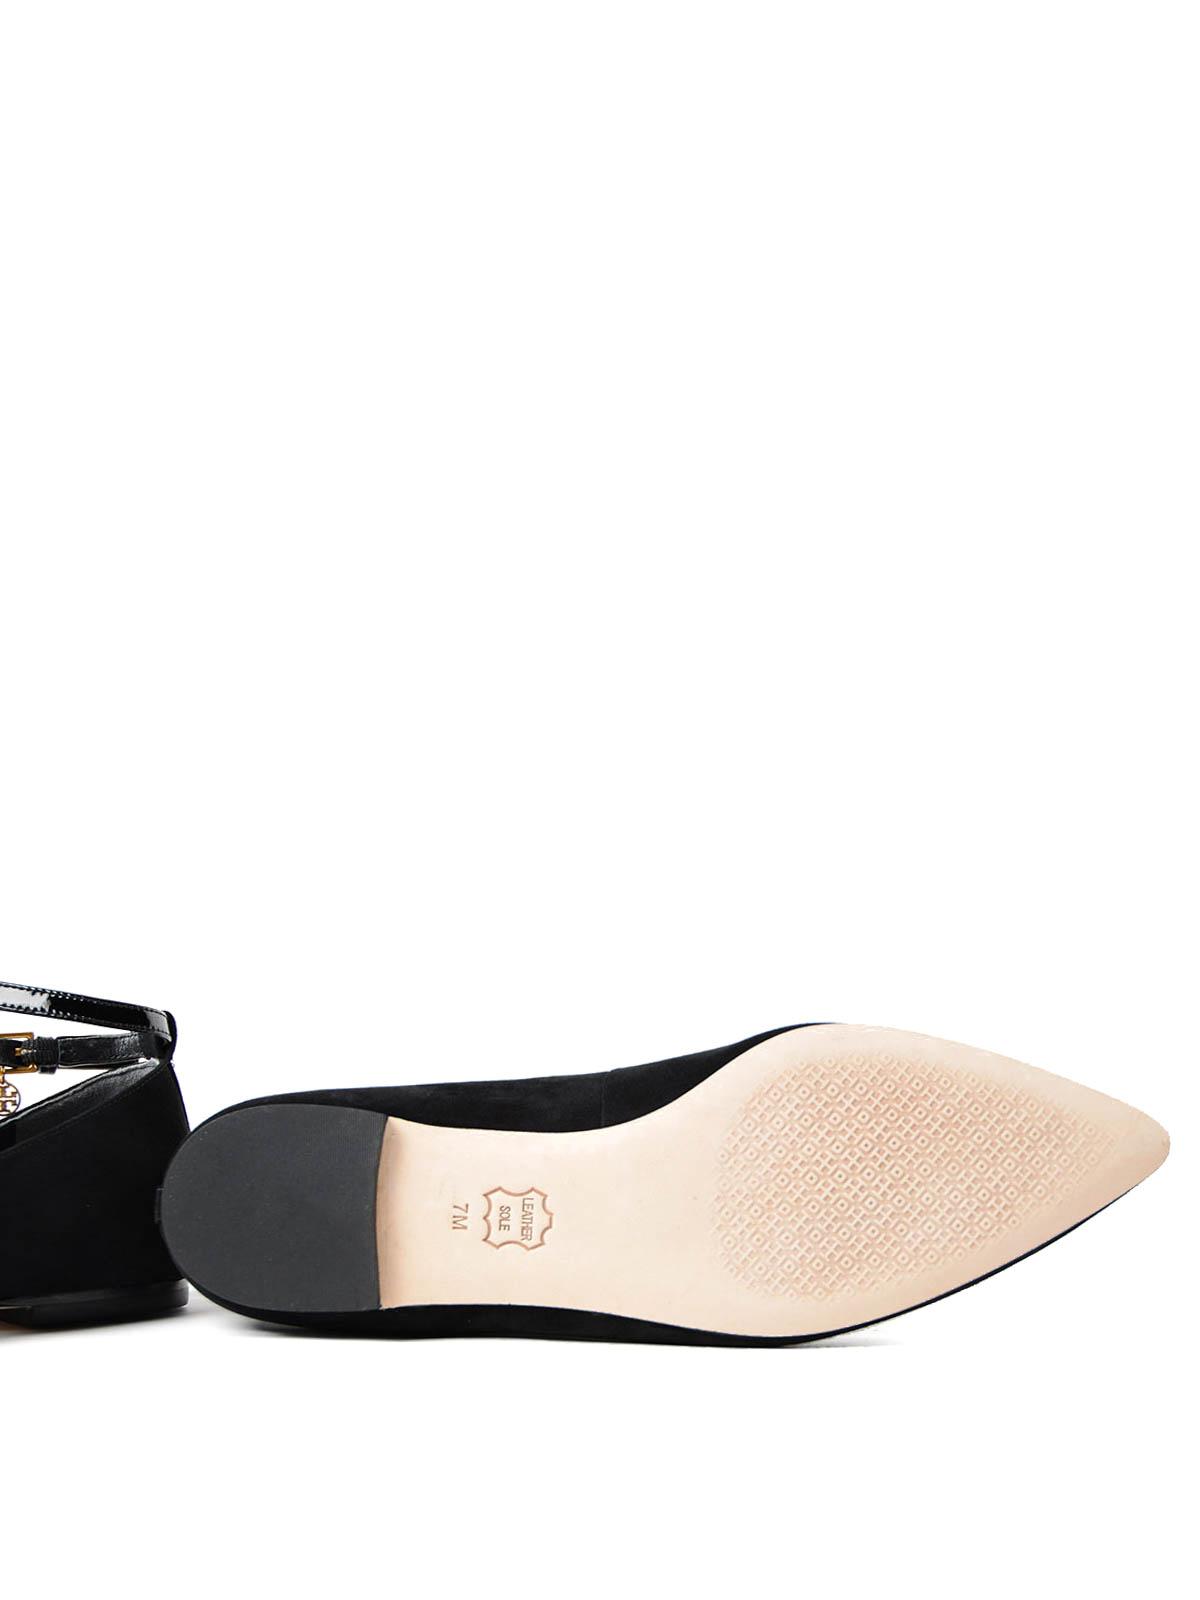 51f0818fa99 Tory Burch - Ashton patent T-strap flat shoes - flat shoes - 42968 009